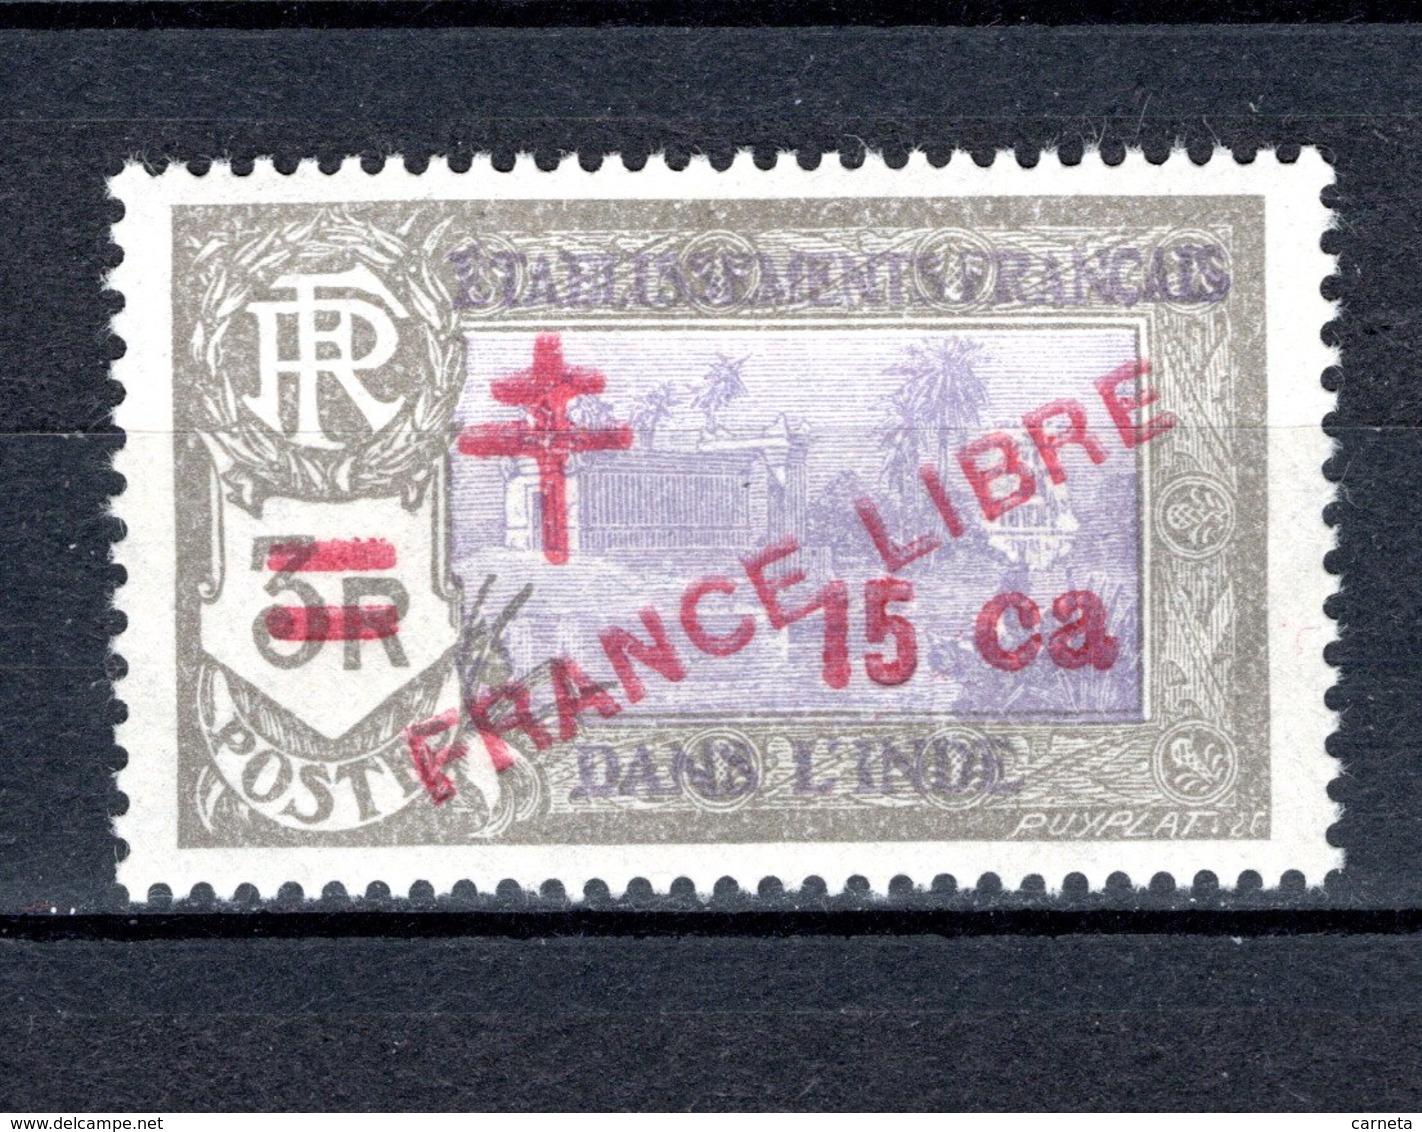 INDE N° 208 NEUF SANS CHARNIERE COTE 1.55€  TEMPLE - Unused Stamps